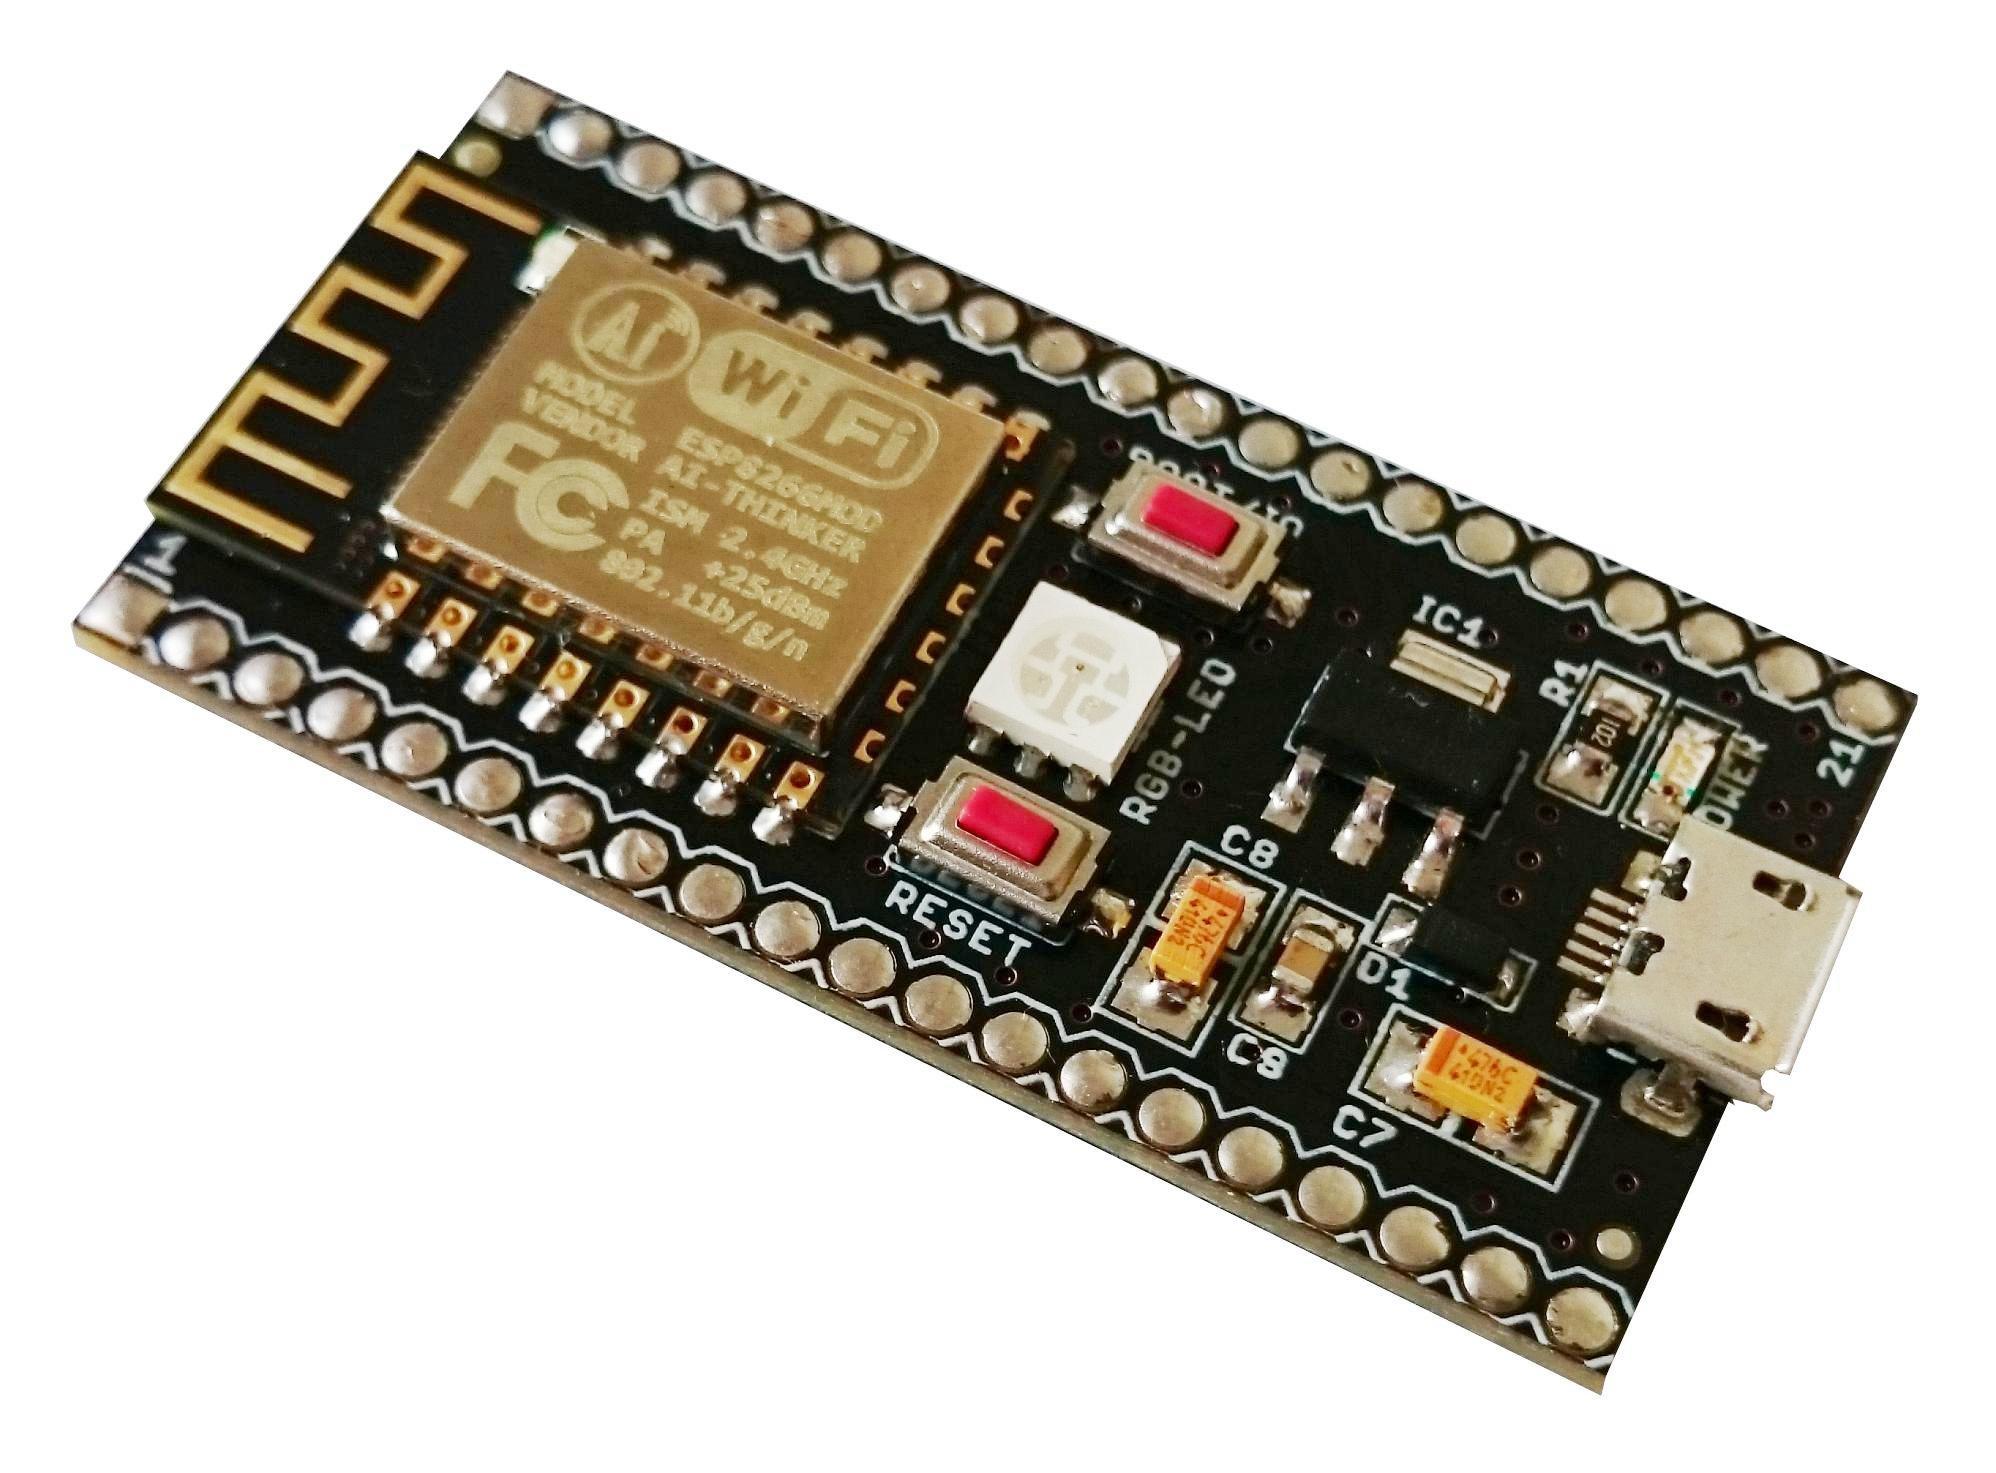 Esp8266 Based Smartwifi Development Module From Knewron On